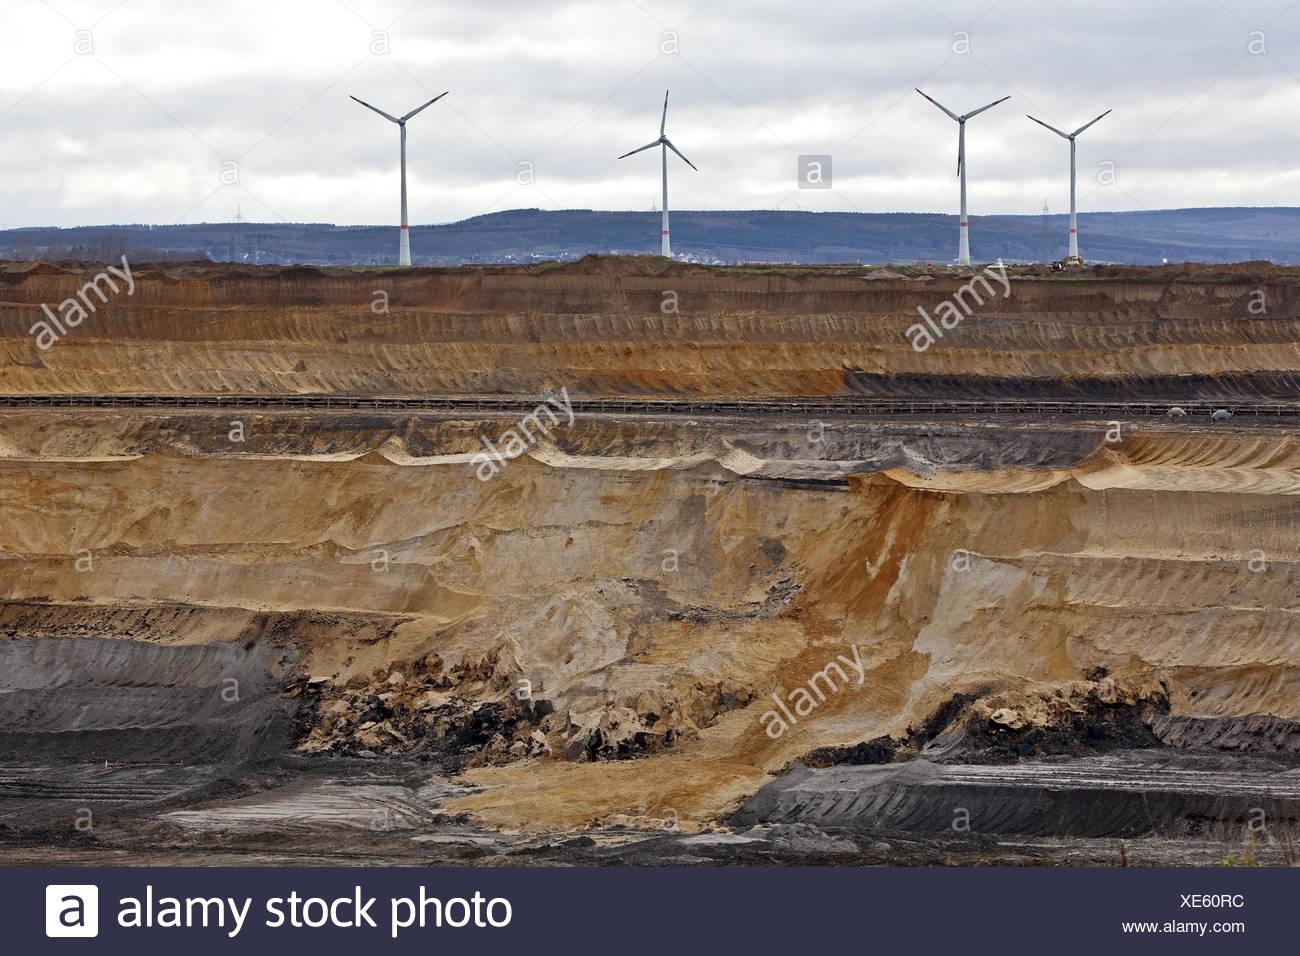 Windkraftanlagen im Braunkohle-Tagebau Inden, North Rhine-Westphalia, Germany, Europe Stockbild